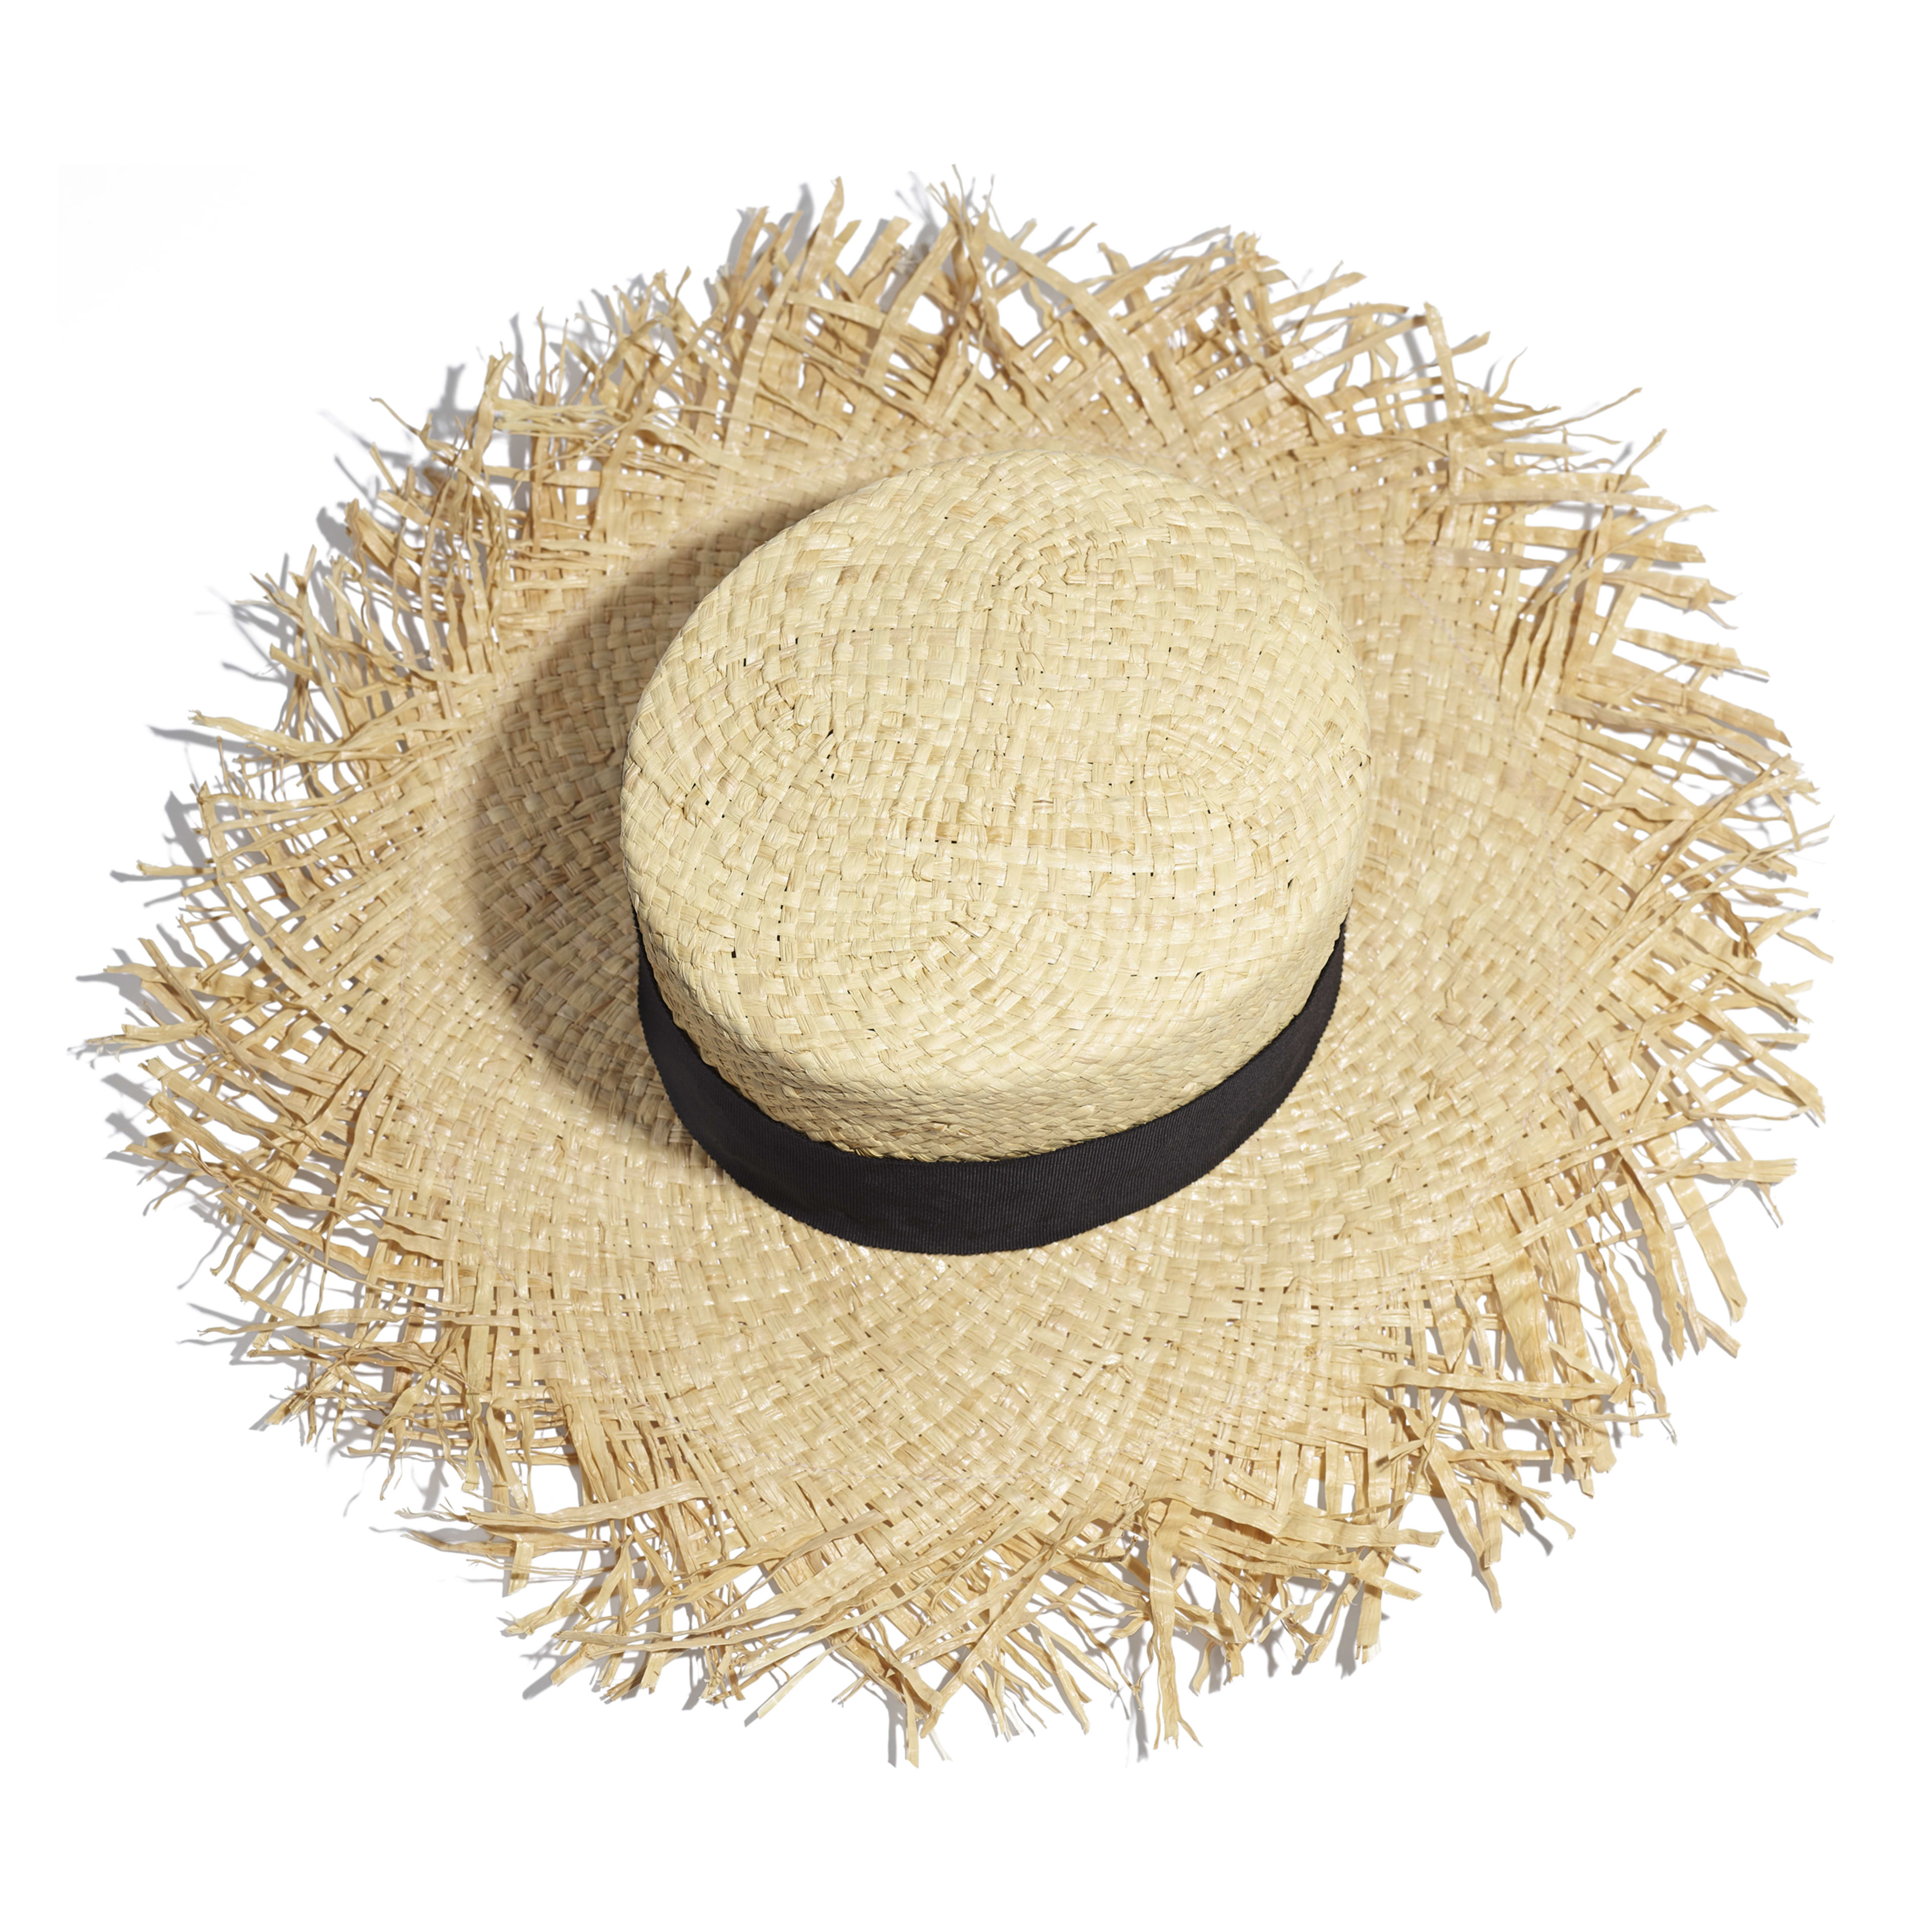 Wide-Brimmed Hat - Beige & Black - Raffia, Grosgrain & Metal - Alternative view - see full sized version